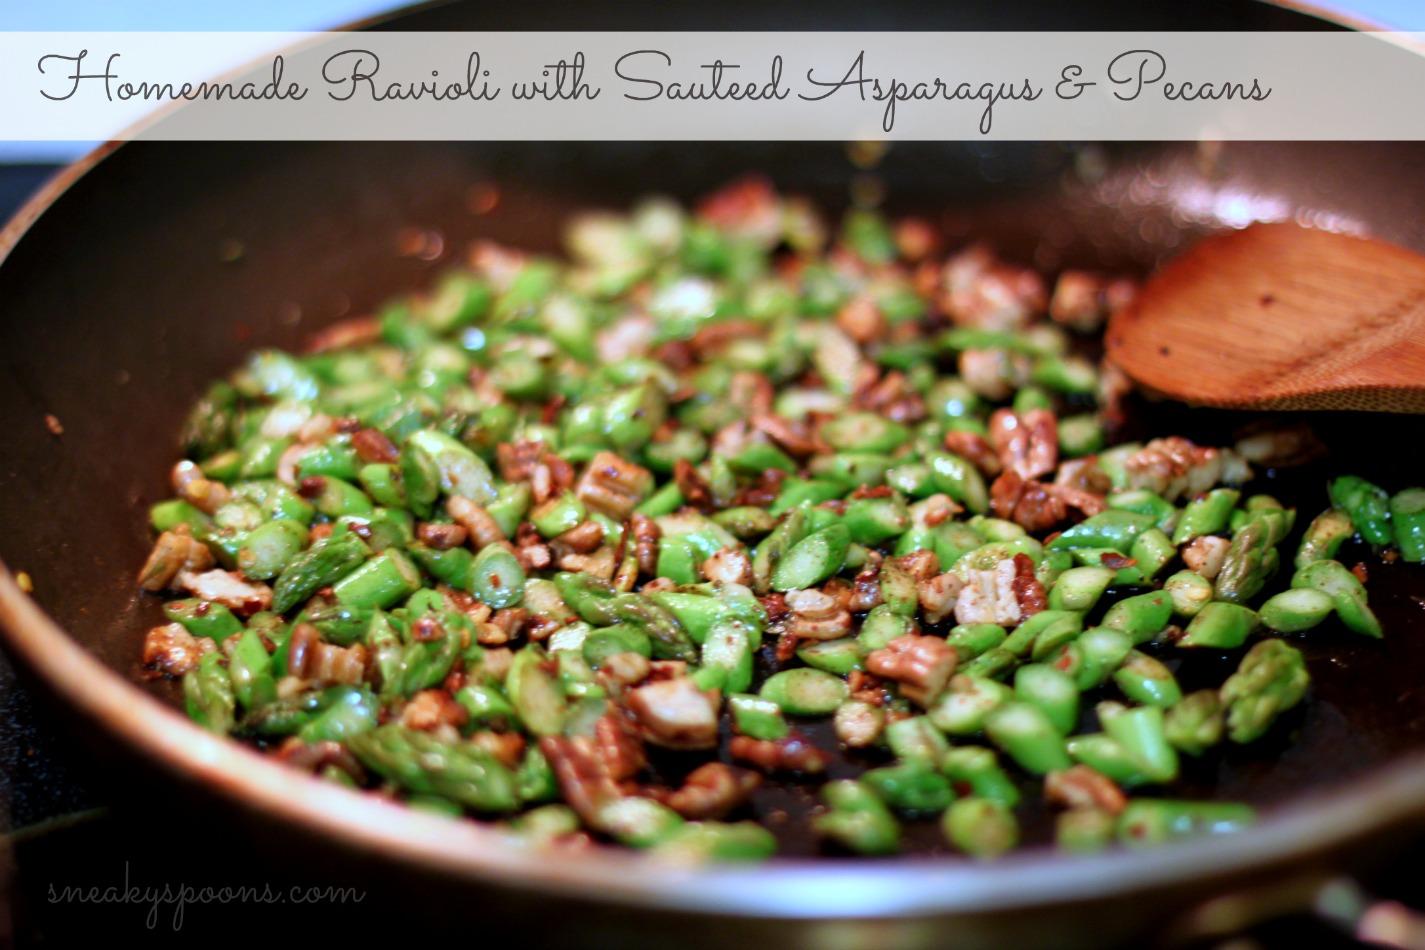 Sauteed Asparagus & Pecans